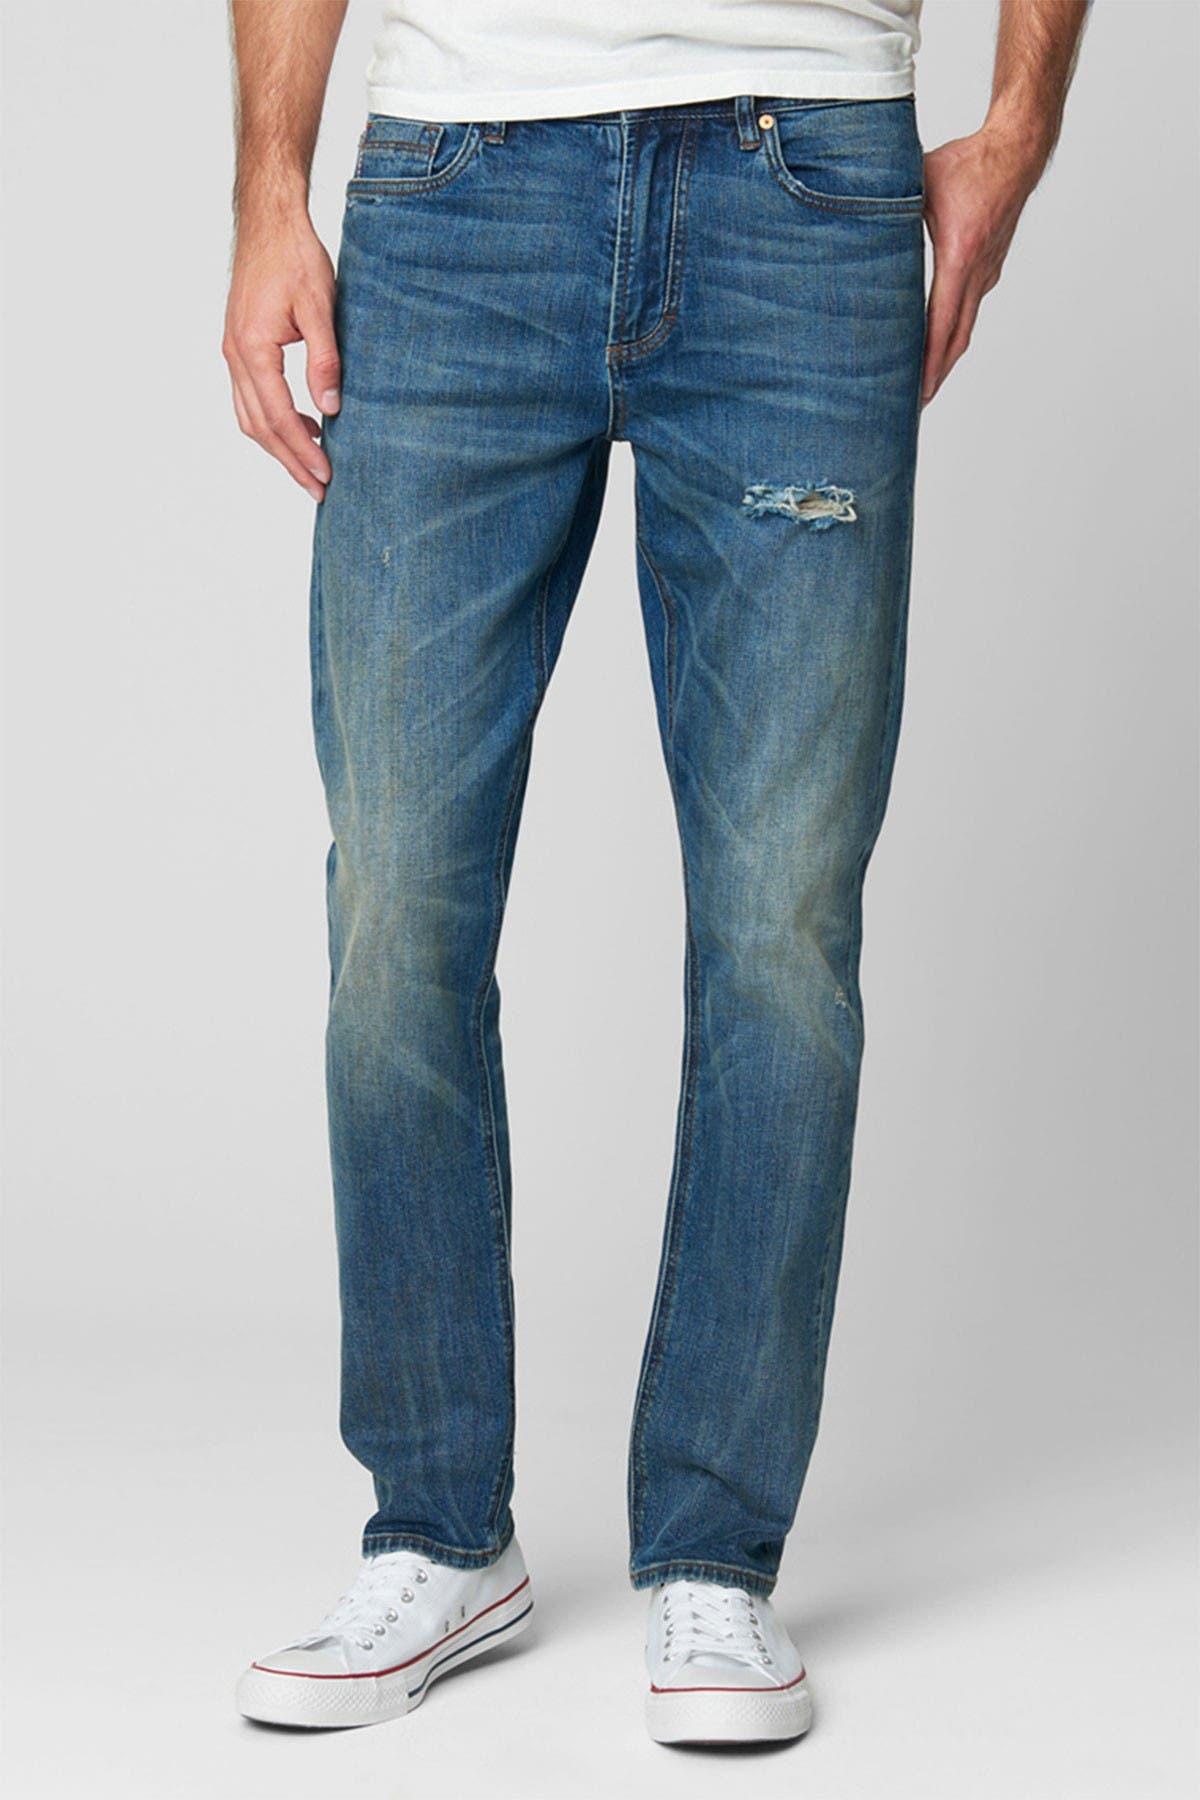 Image of BLANKNYC Denim Stanton Distressed Straight Leg Jeans